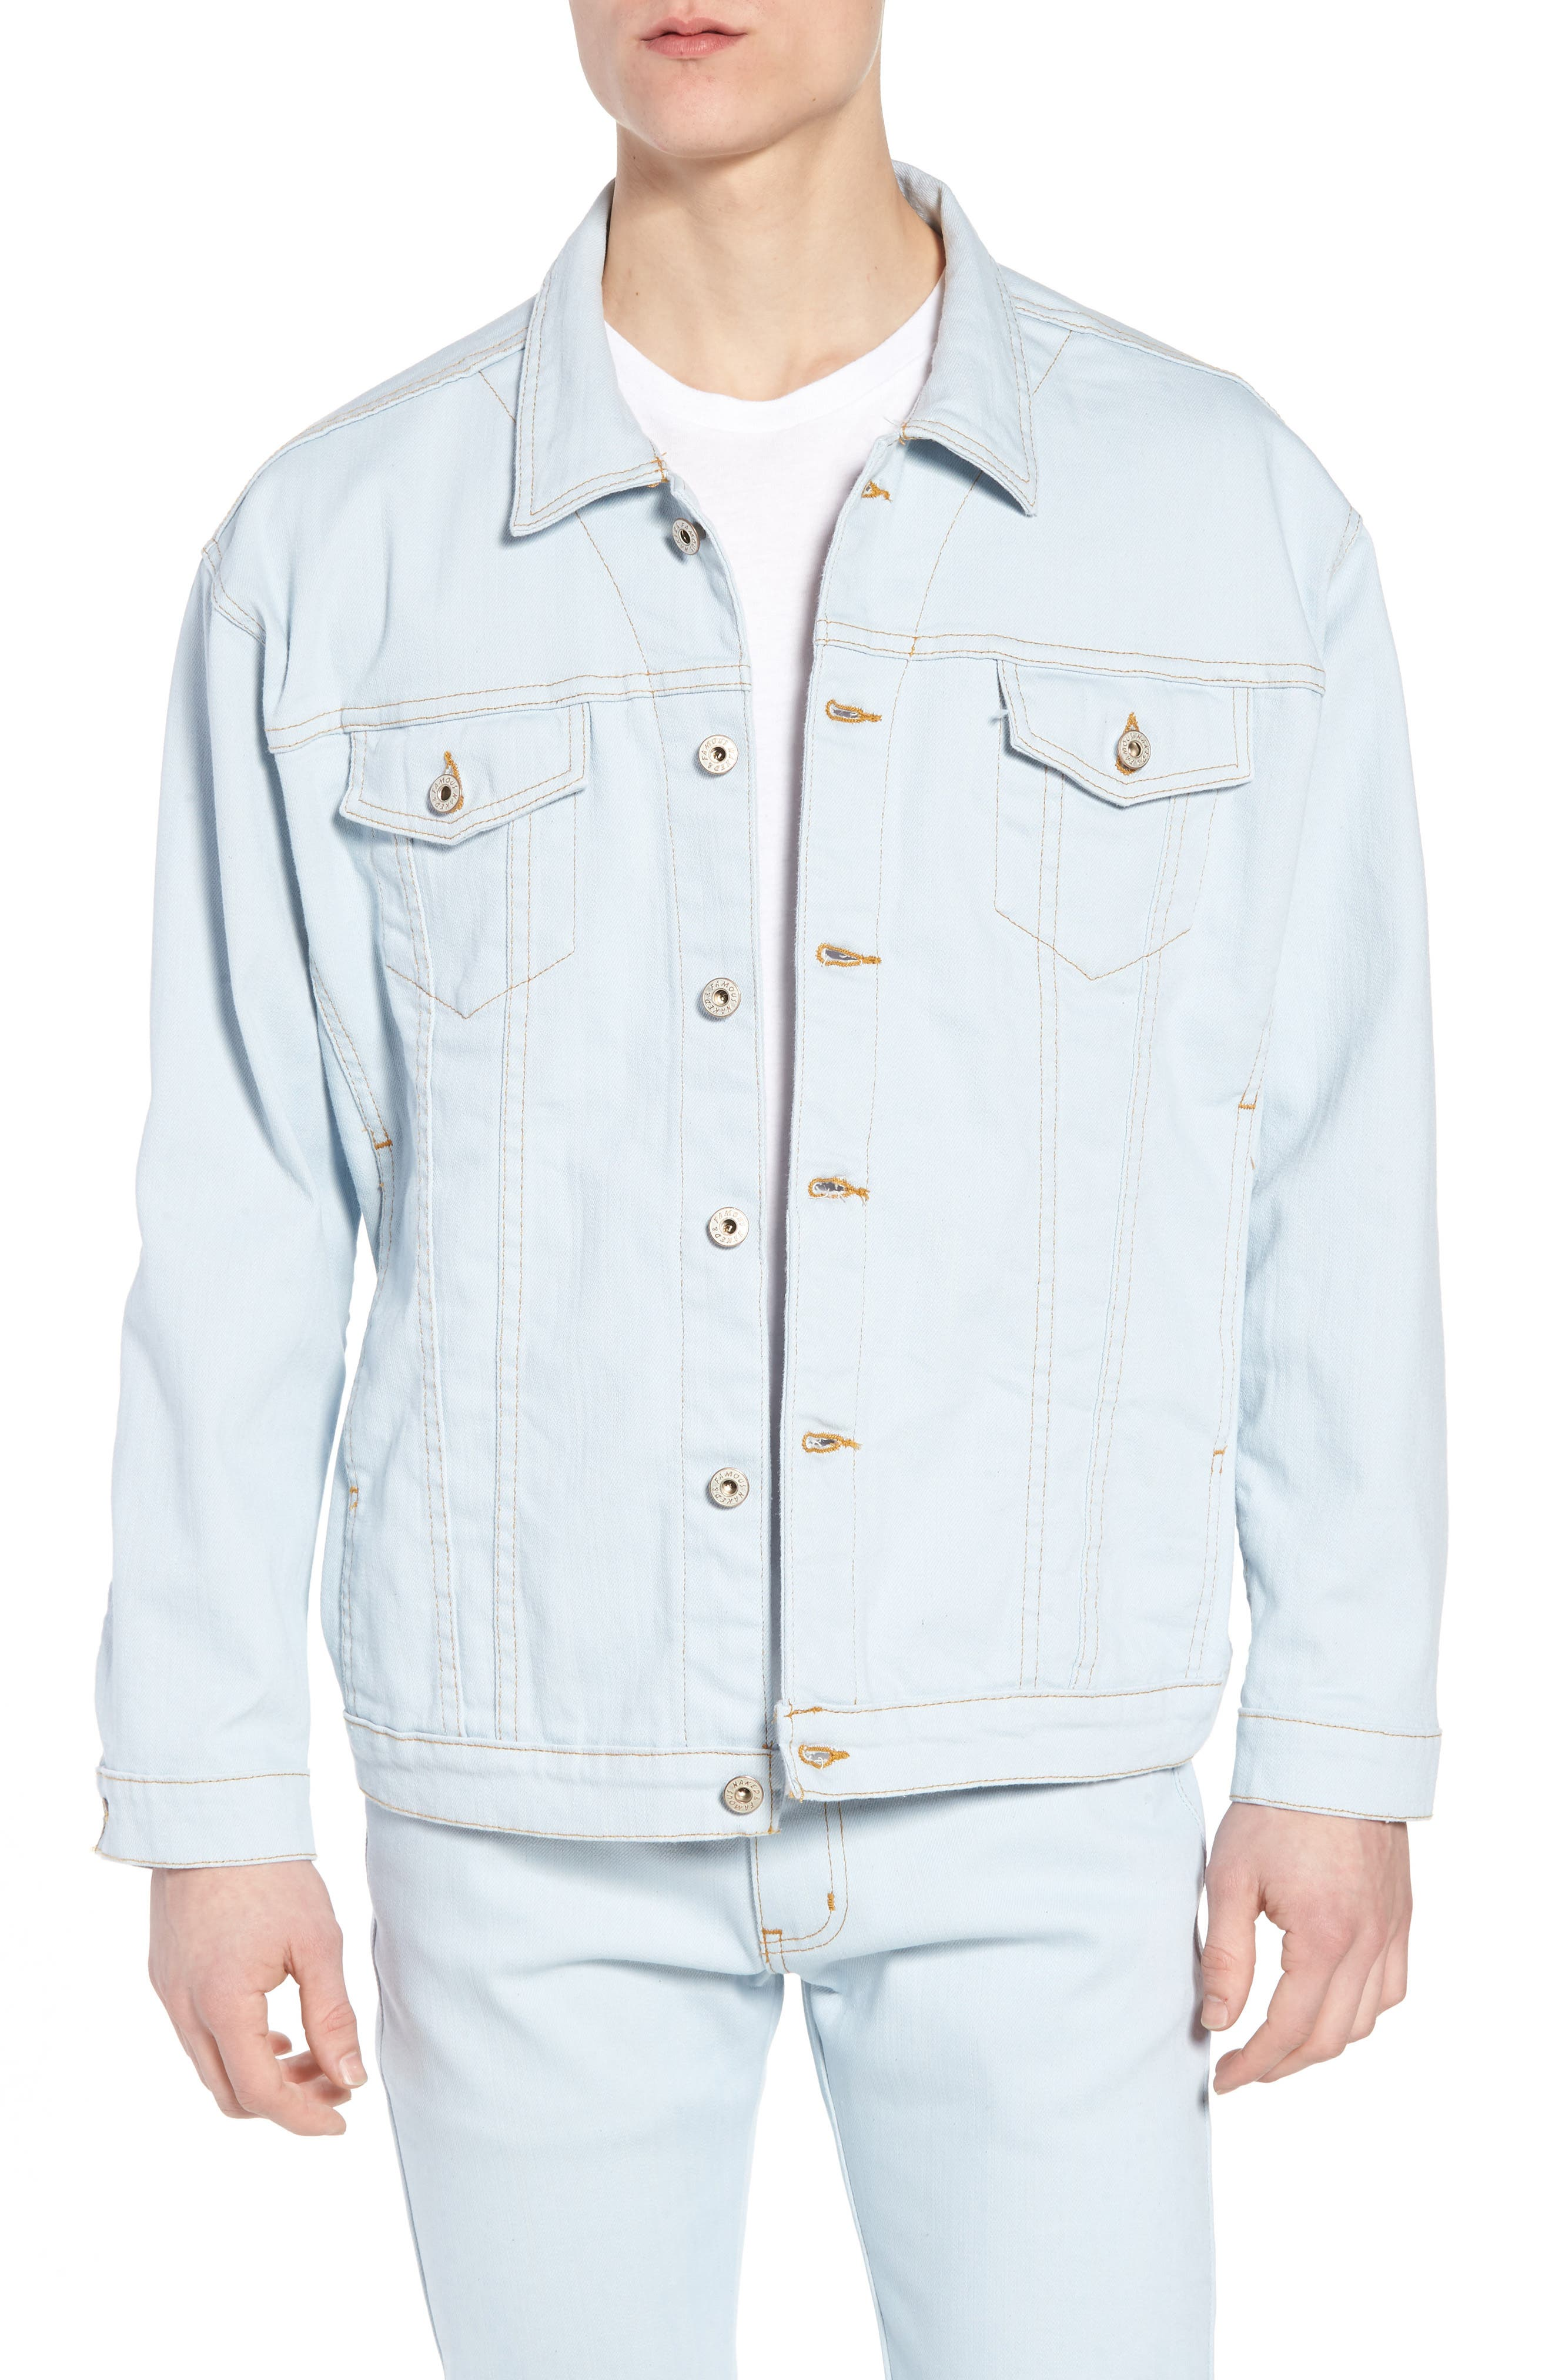 Oversize Jacket,                             Main thumbnail 1, color,                             Powder Blue